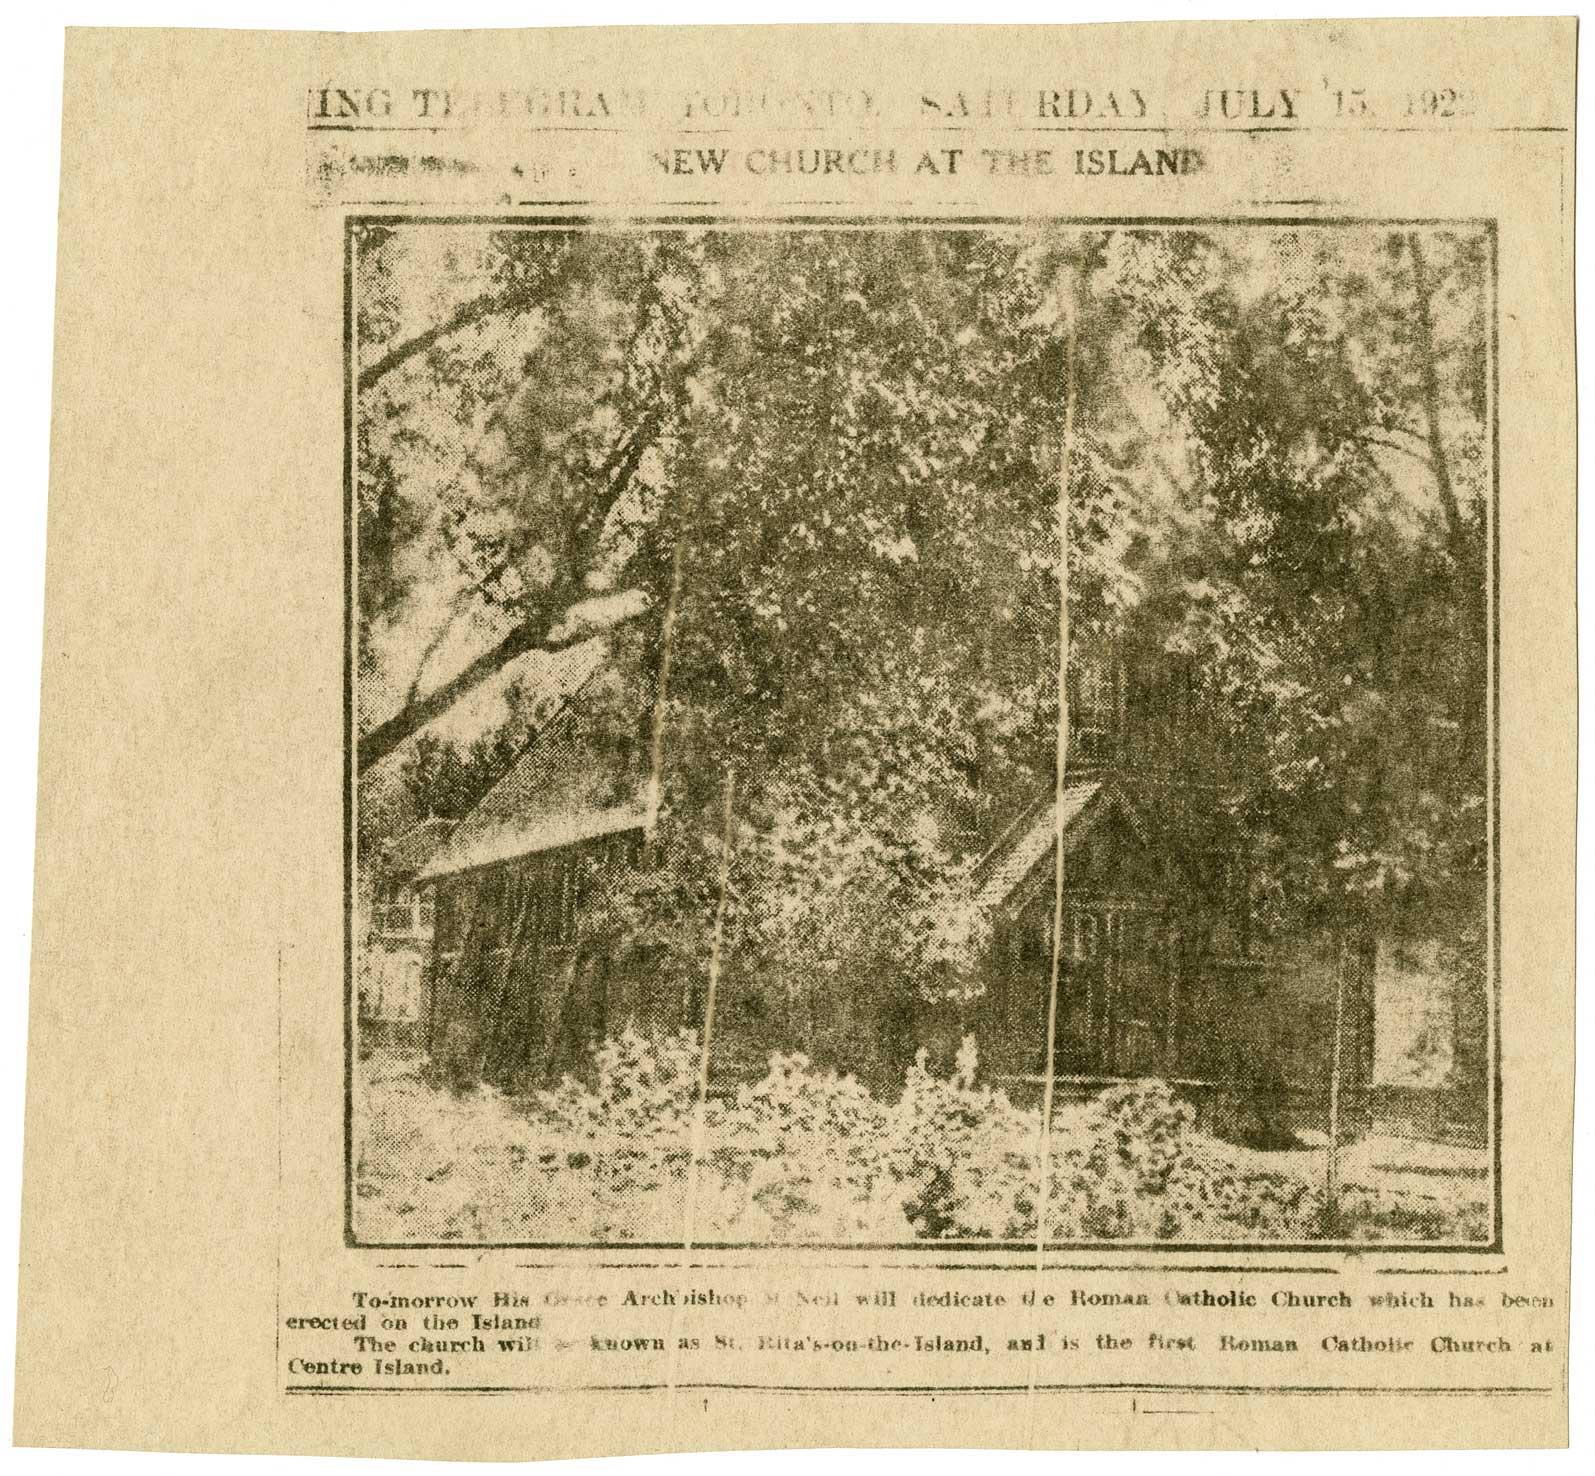 The Archivist\'s Pencil: Island Living: St. Rita\'s Mission Church